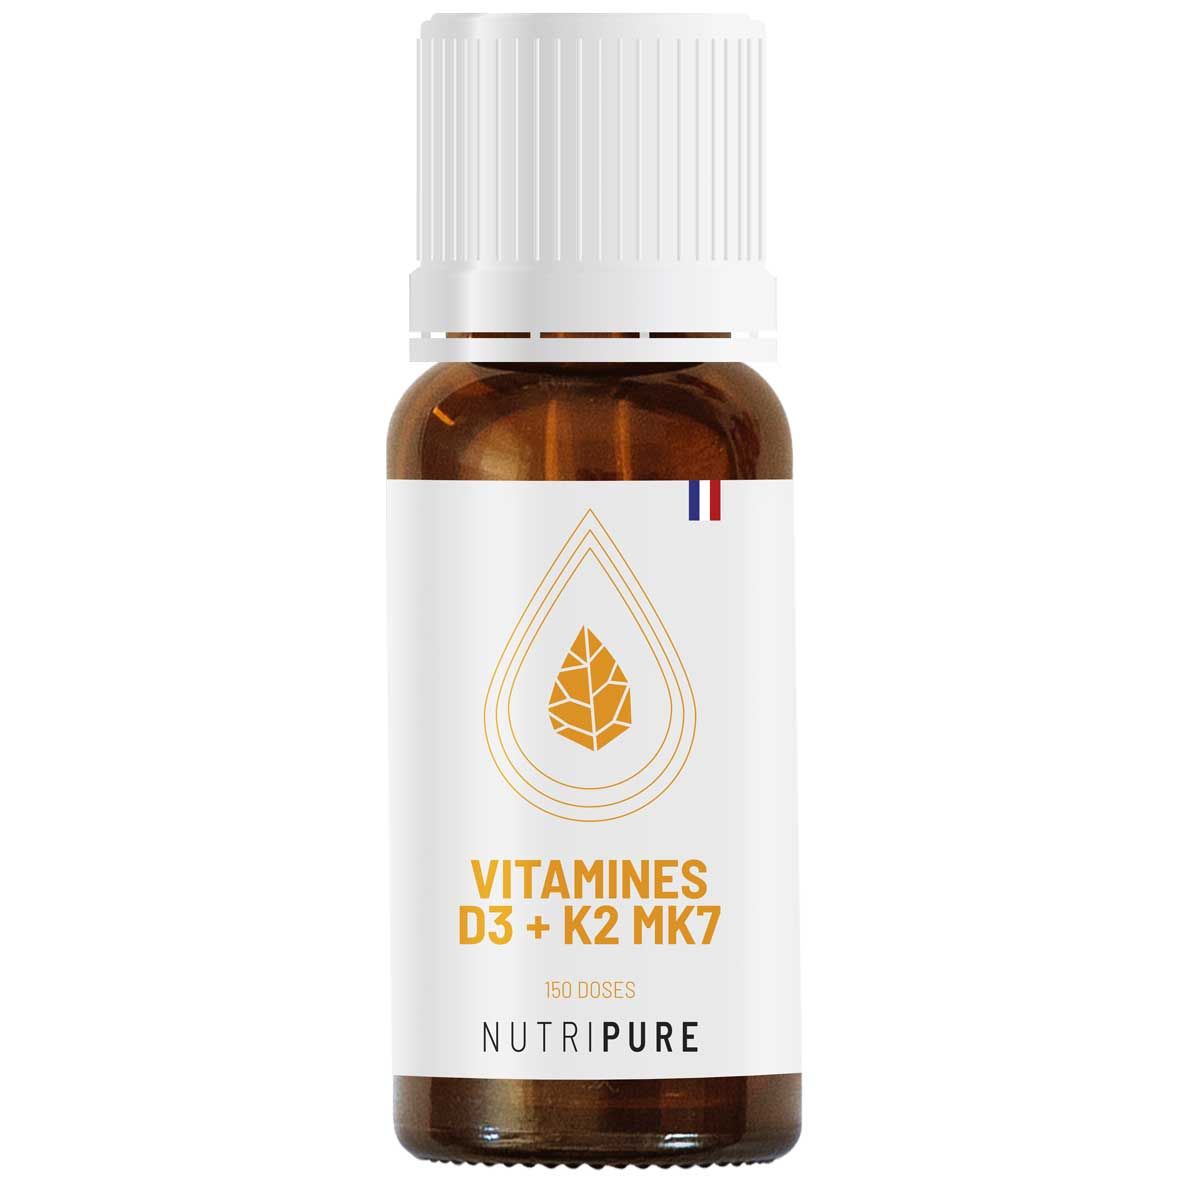 vitamine D3 K2 mk7